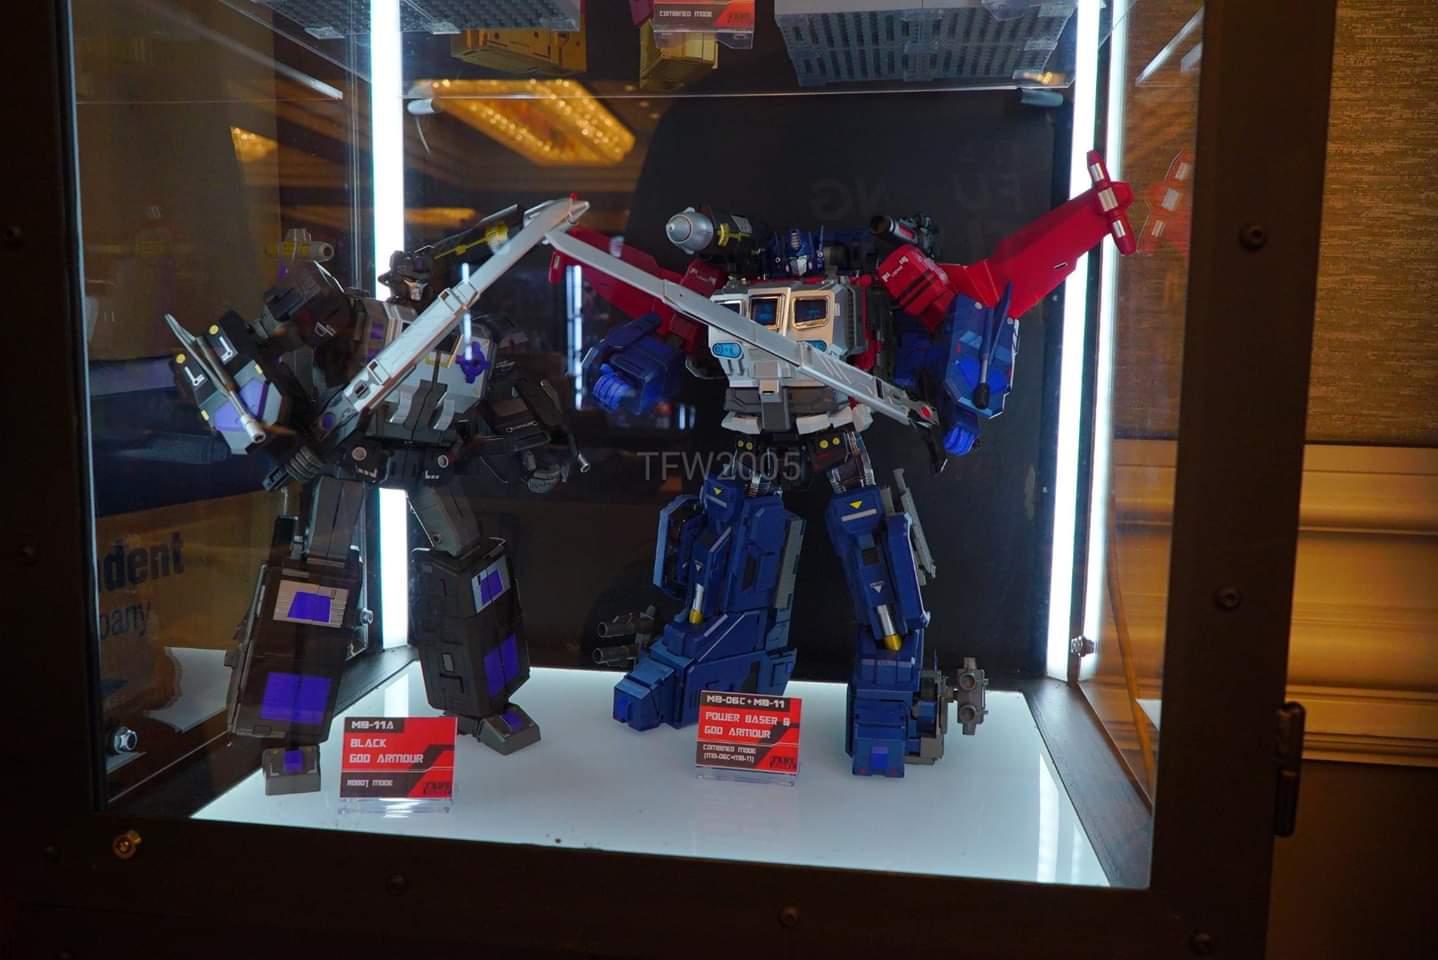 [FansHobby] Produit Tiers - MB-06 Power Baser (aka Powermaster Optimus) + MB-11 God Armour (aka Godbomber) - TF Masterforce - Page 4 S3Tdma7q_o